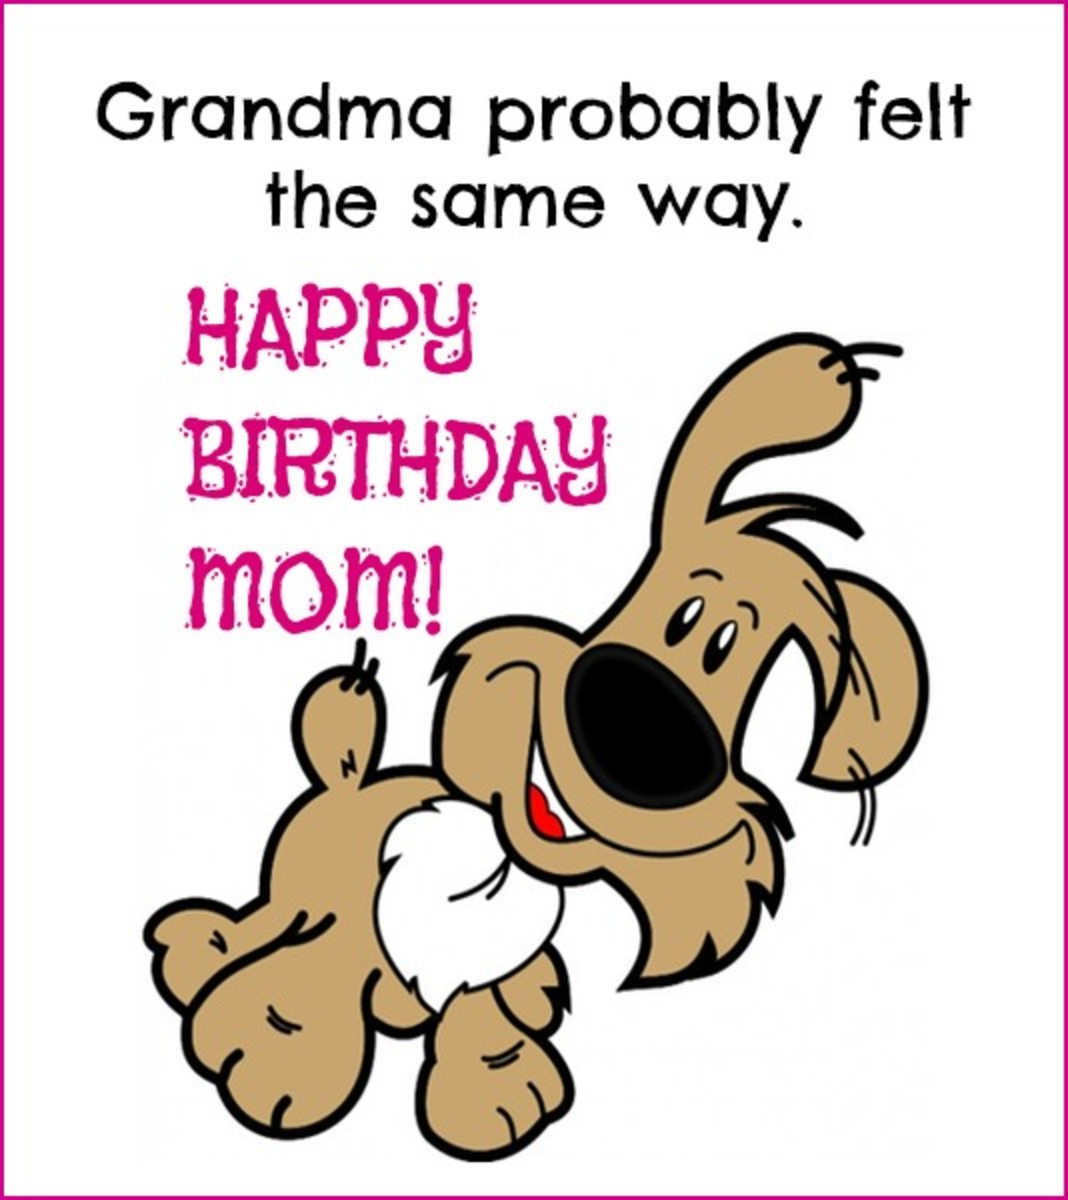 Inside Funny Card for Happy Birthday Mom